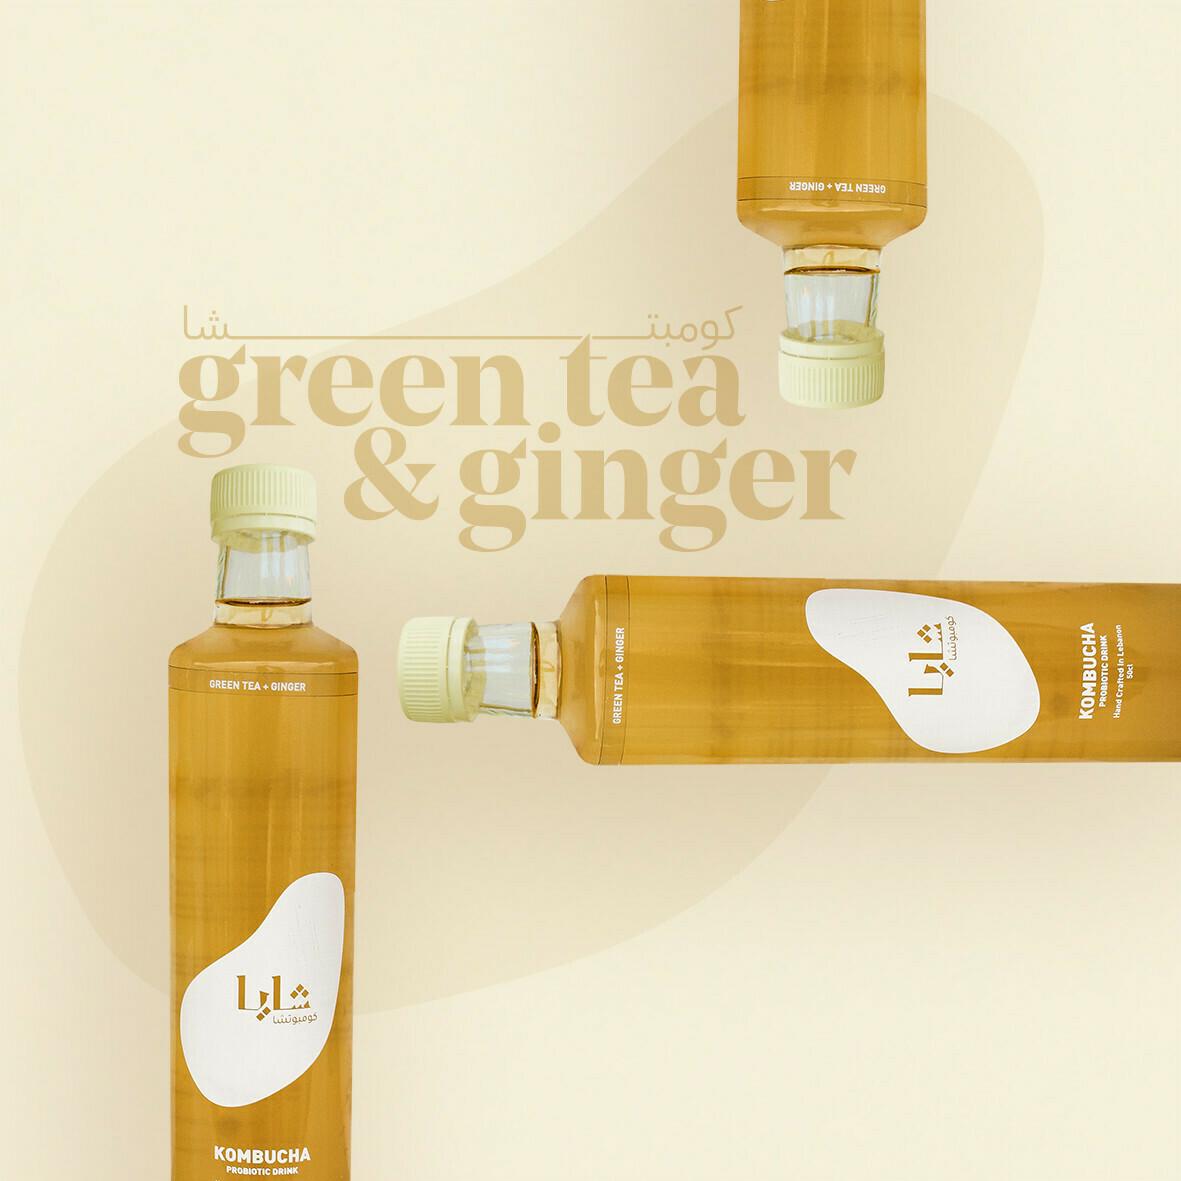 Kombucha Green Tea and Ginger (Bottle) - Shaya